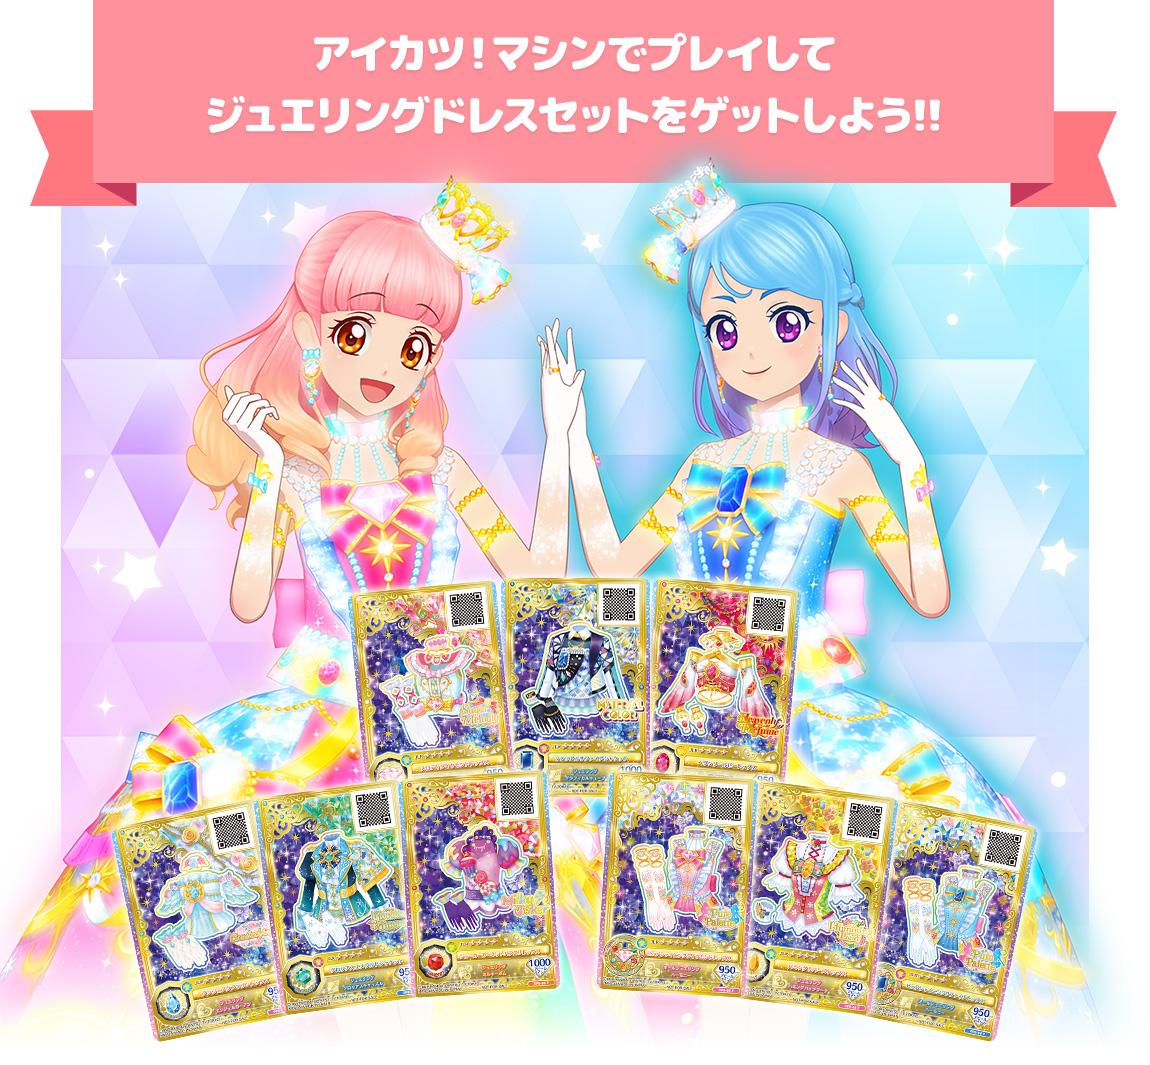 Minato Mio Mio Minato Aikatsu Friends Zerochan Anime Image Board